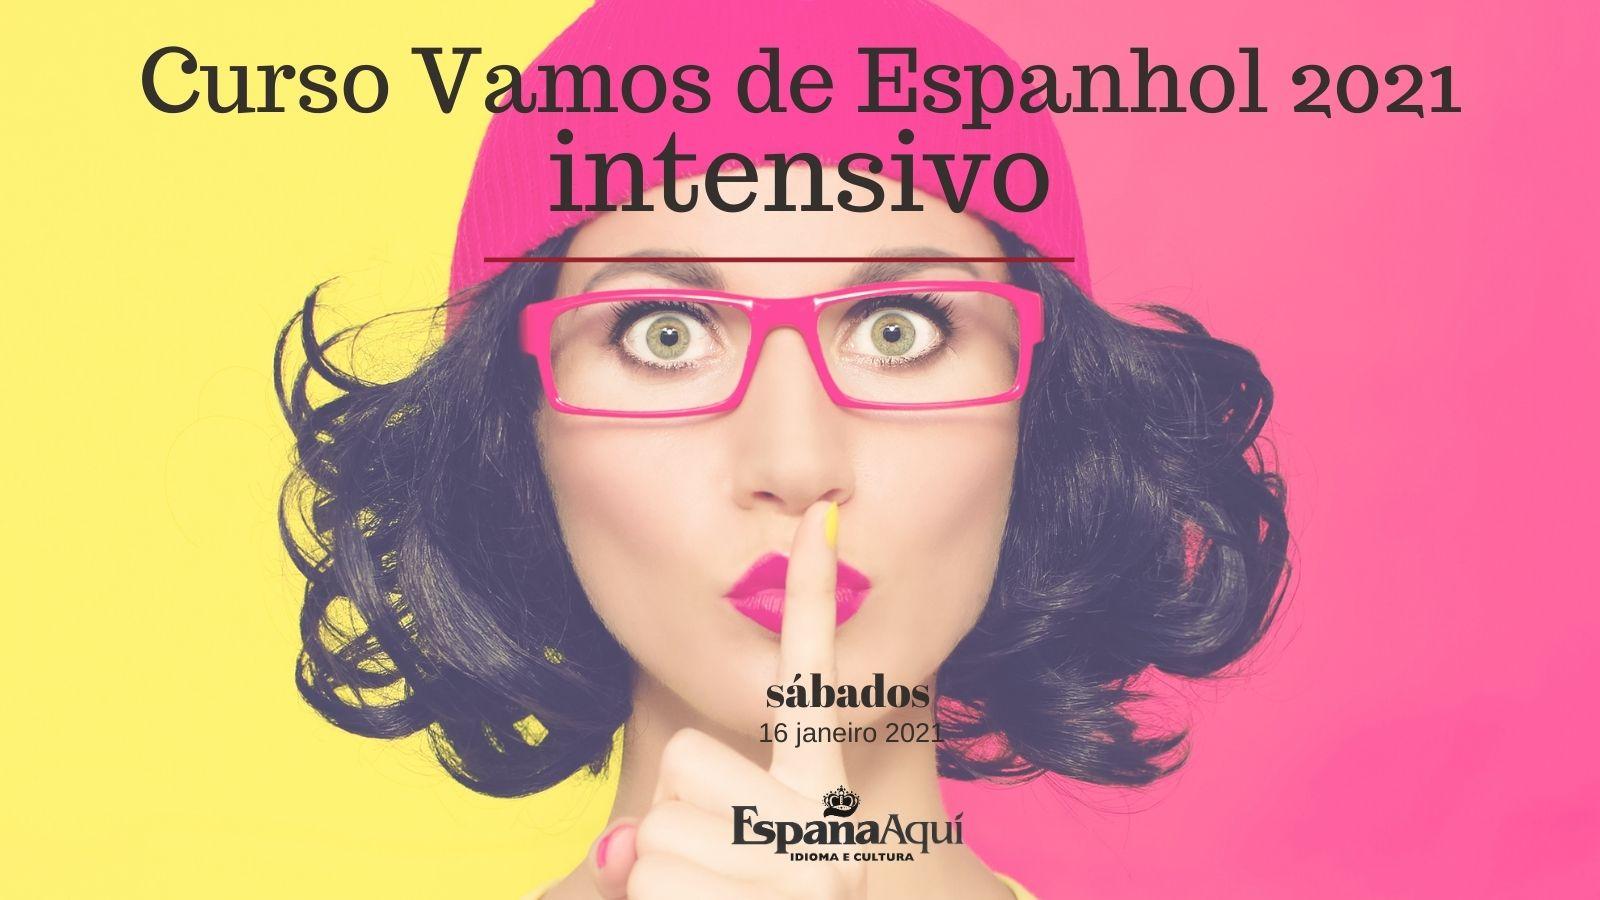 https://www.espanaaqui.com.br/pdf/fevereiro%202021/intensivo%20twitter%202021.jpg